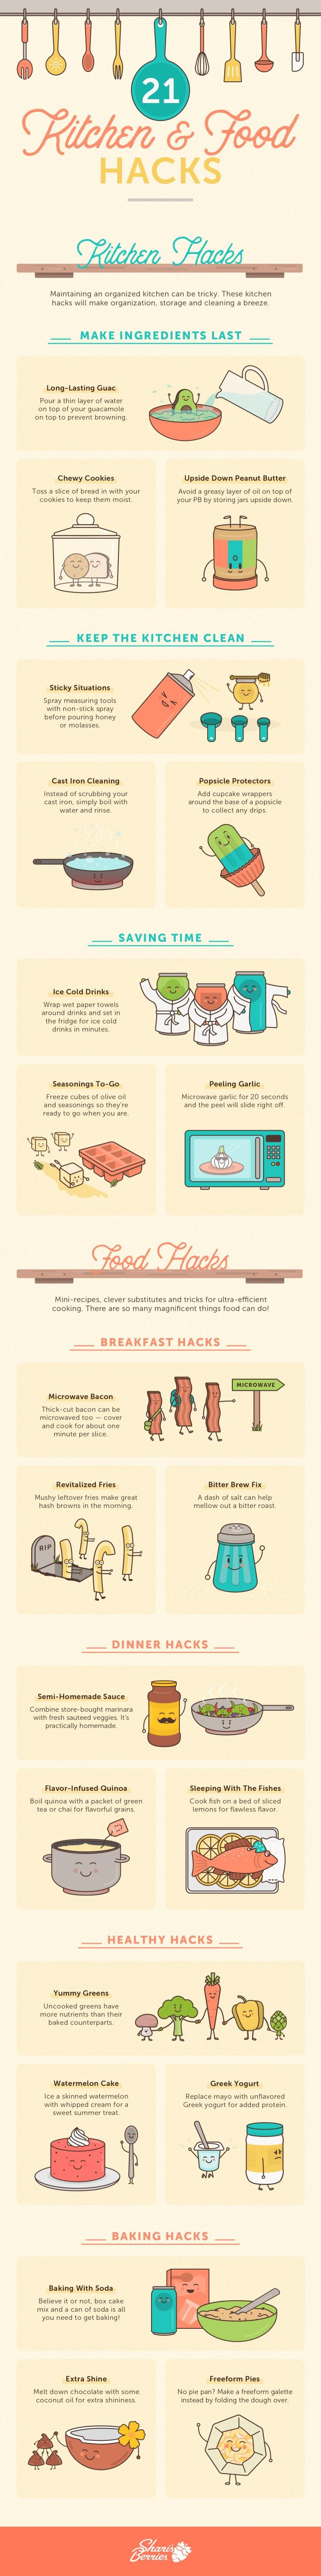 food-hacks-IG-2.jpg